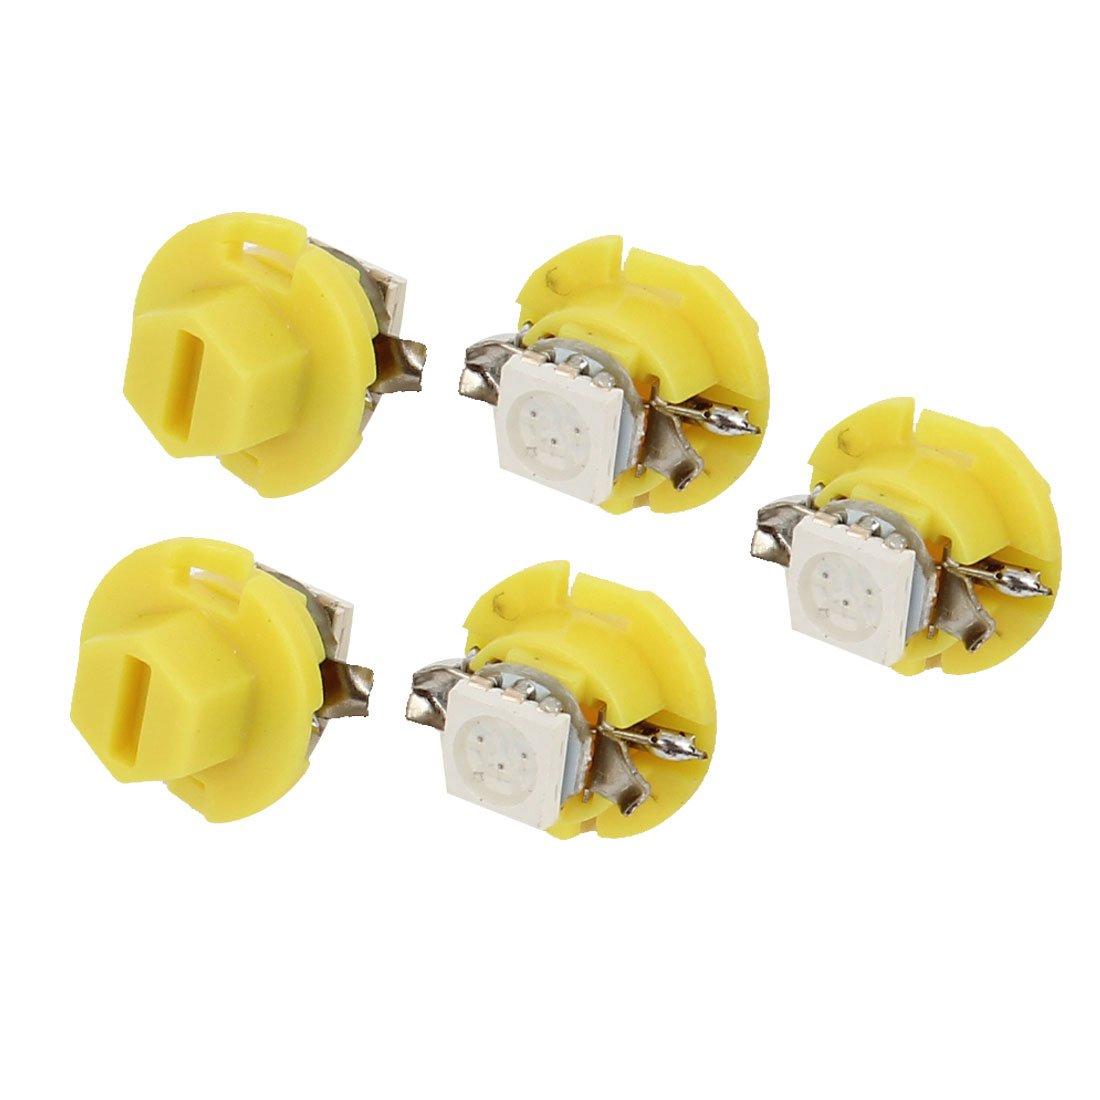 Car Yellow B8.4D 5050 SMD 1-LED Dome Roof Light Bulb 5 Pcs Internal